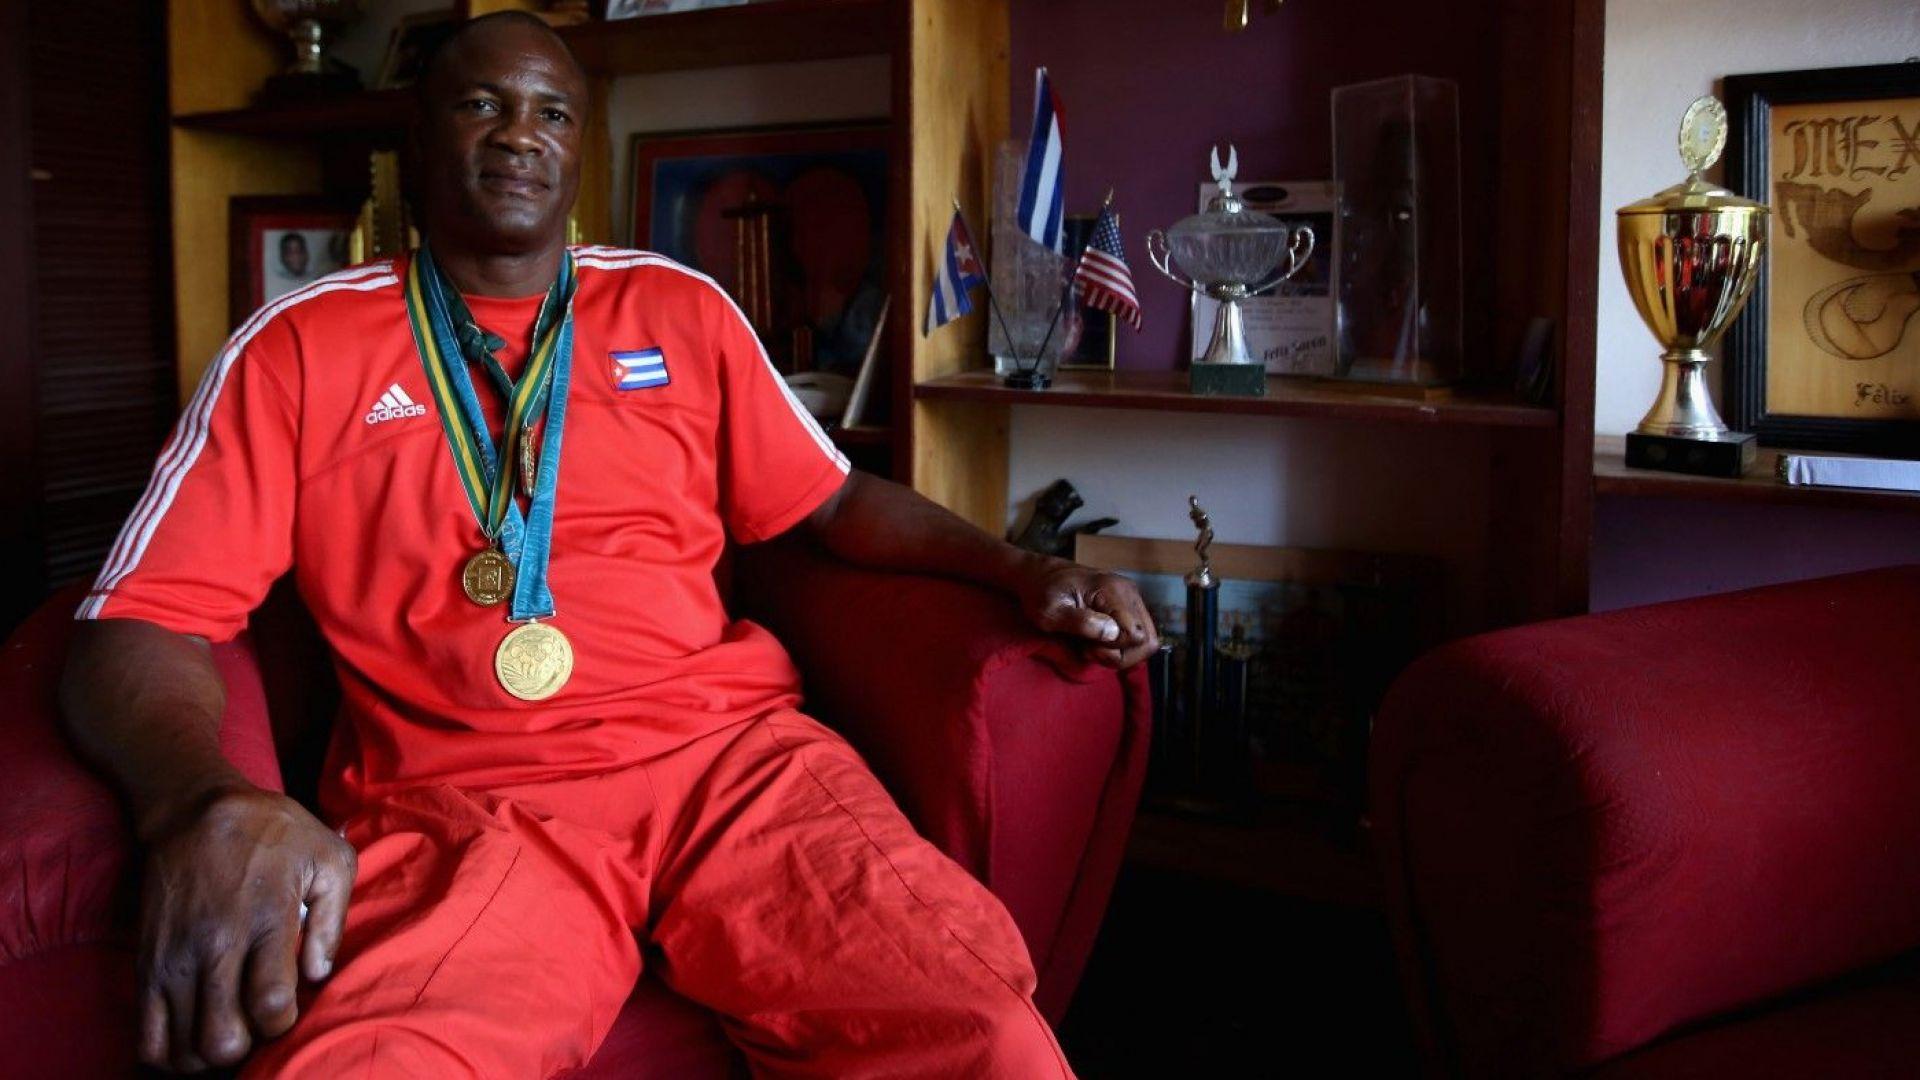 Арестуваха трикратен олимпийски шампион, изнасилил дете